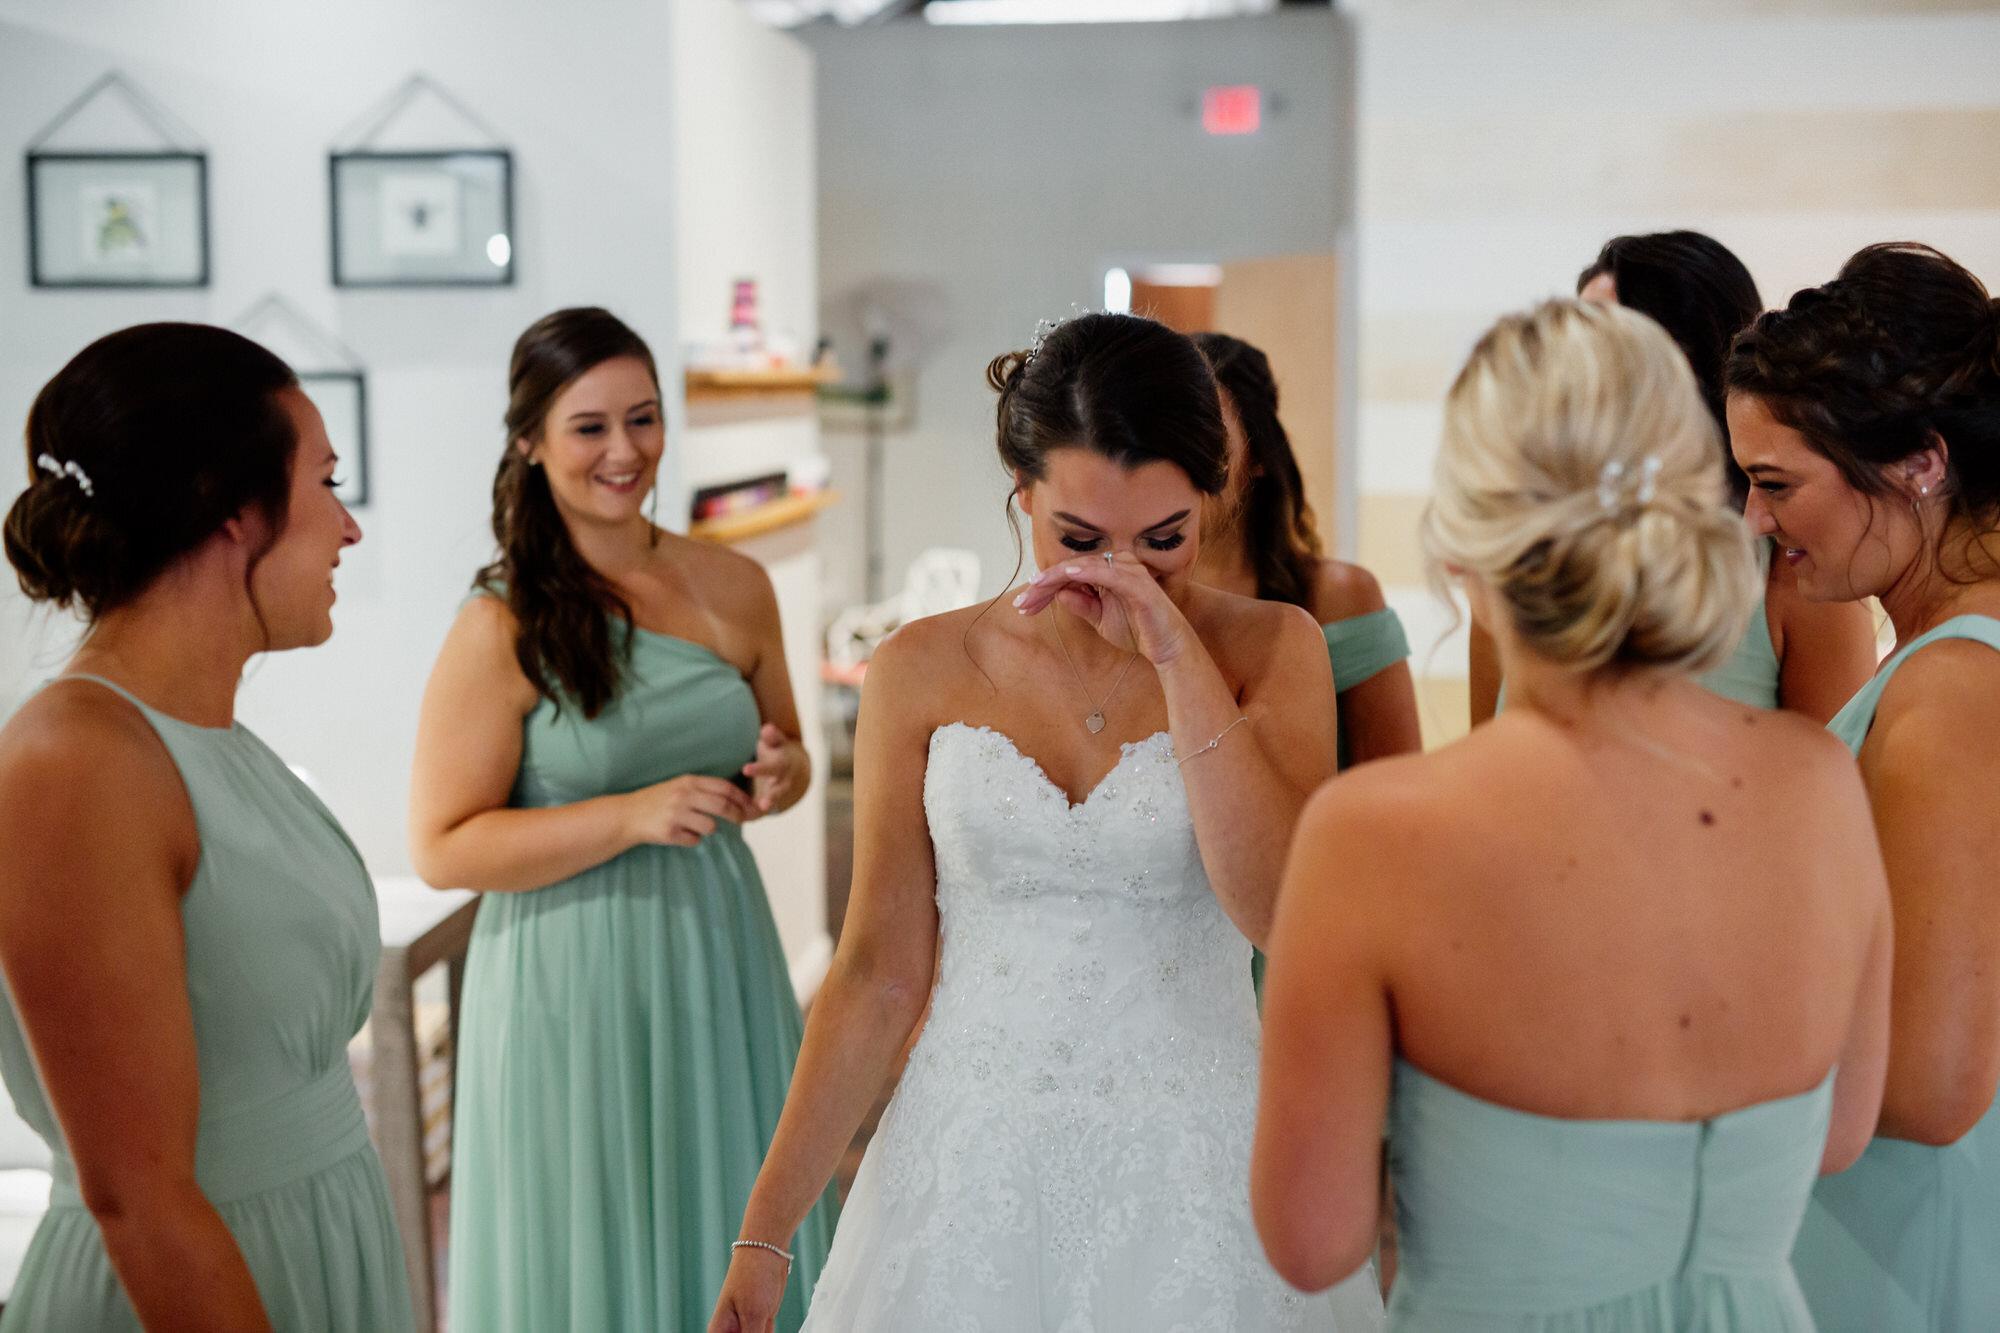 twigs-tempietto-wedding-greenville-downtown-272.JPG